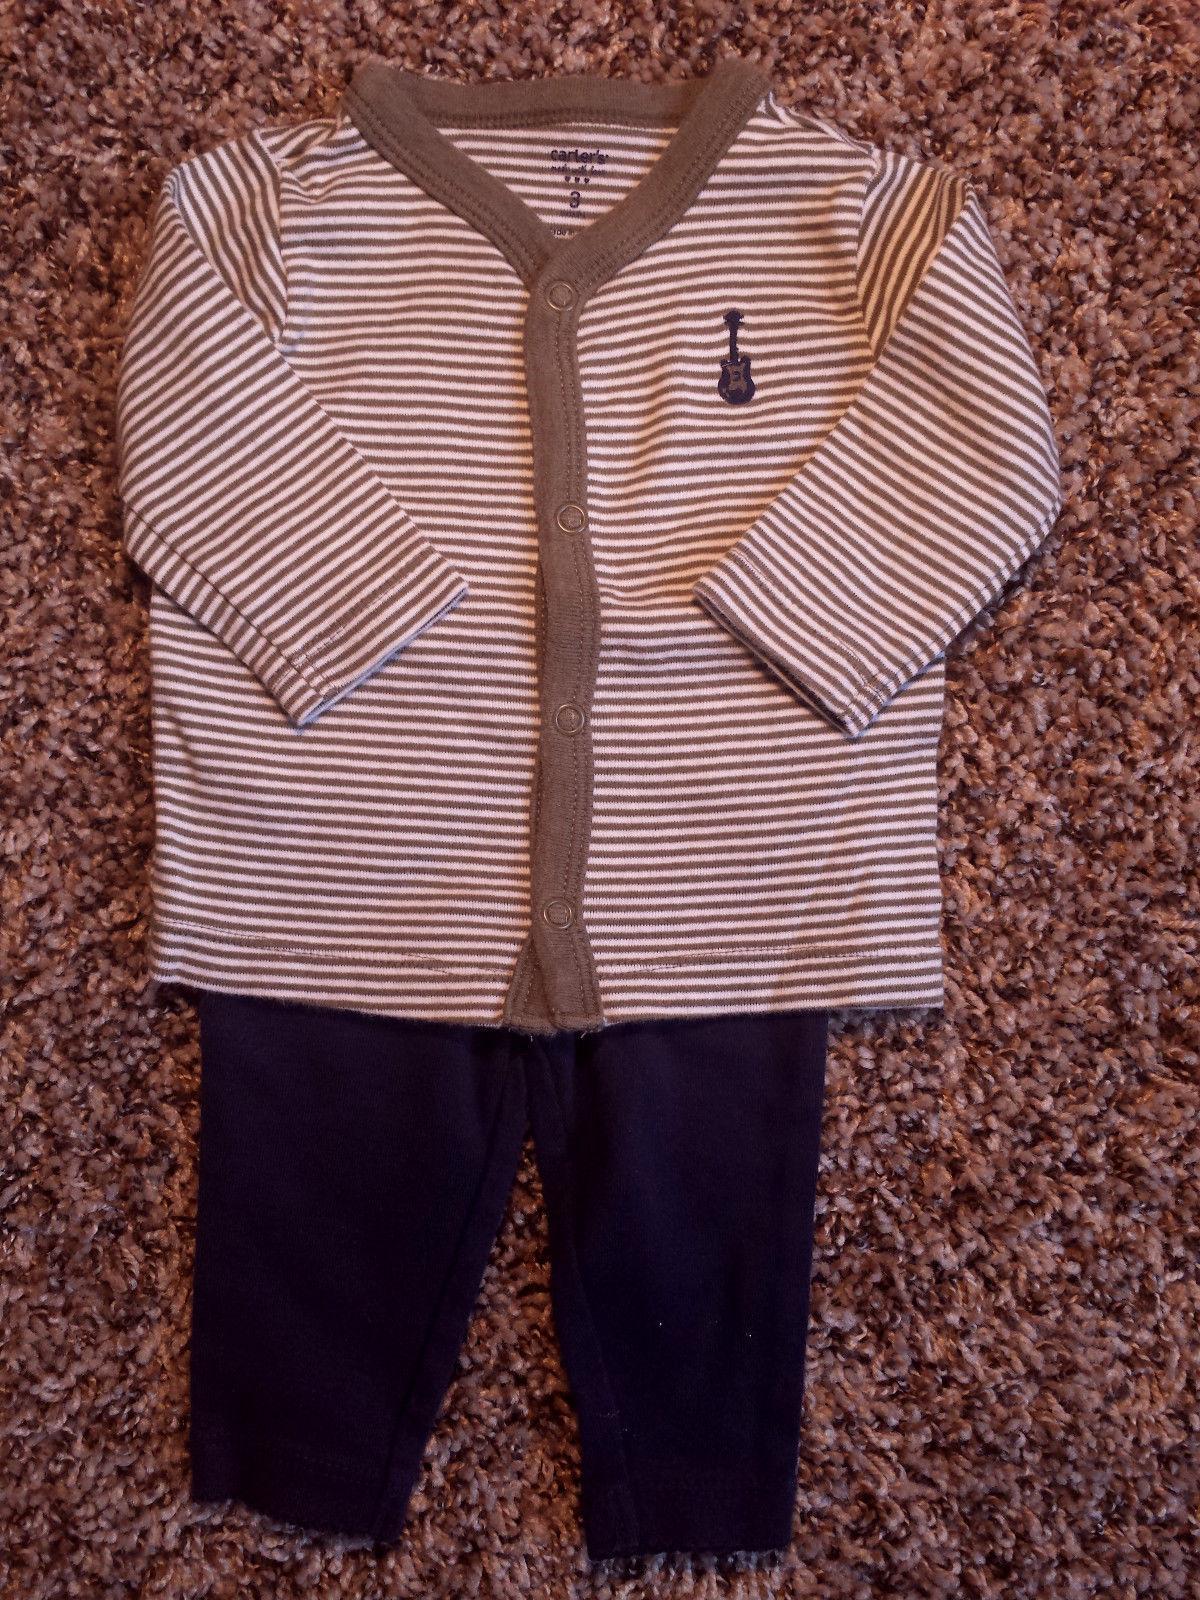 Boy's Size 3 M 0-3 Months 2 Piece Carter's Gray Striped Guitar Top & Navy Pants